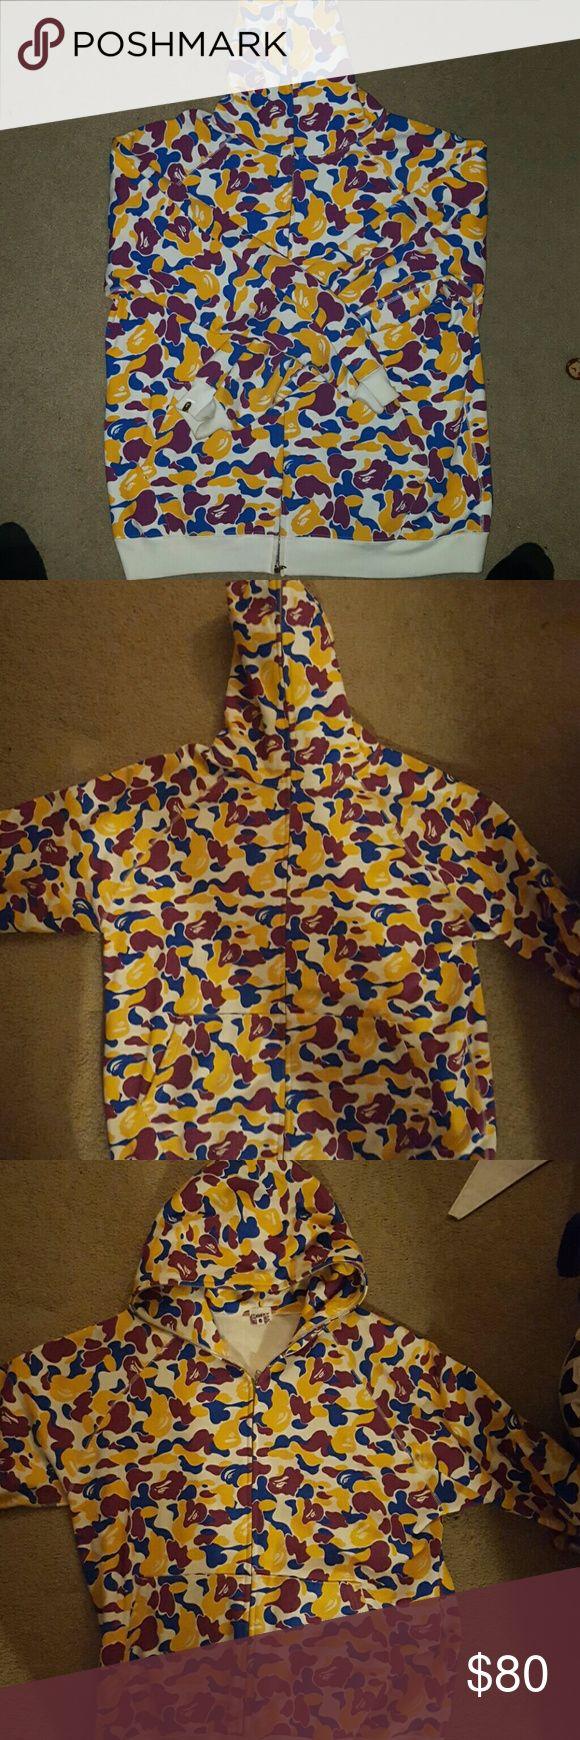 Bathing ape Zip up hoodie White yellow purple blue gorilla bape prints, zipper zips all the way up Bathing Ape Jackets & Coats